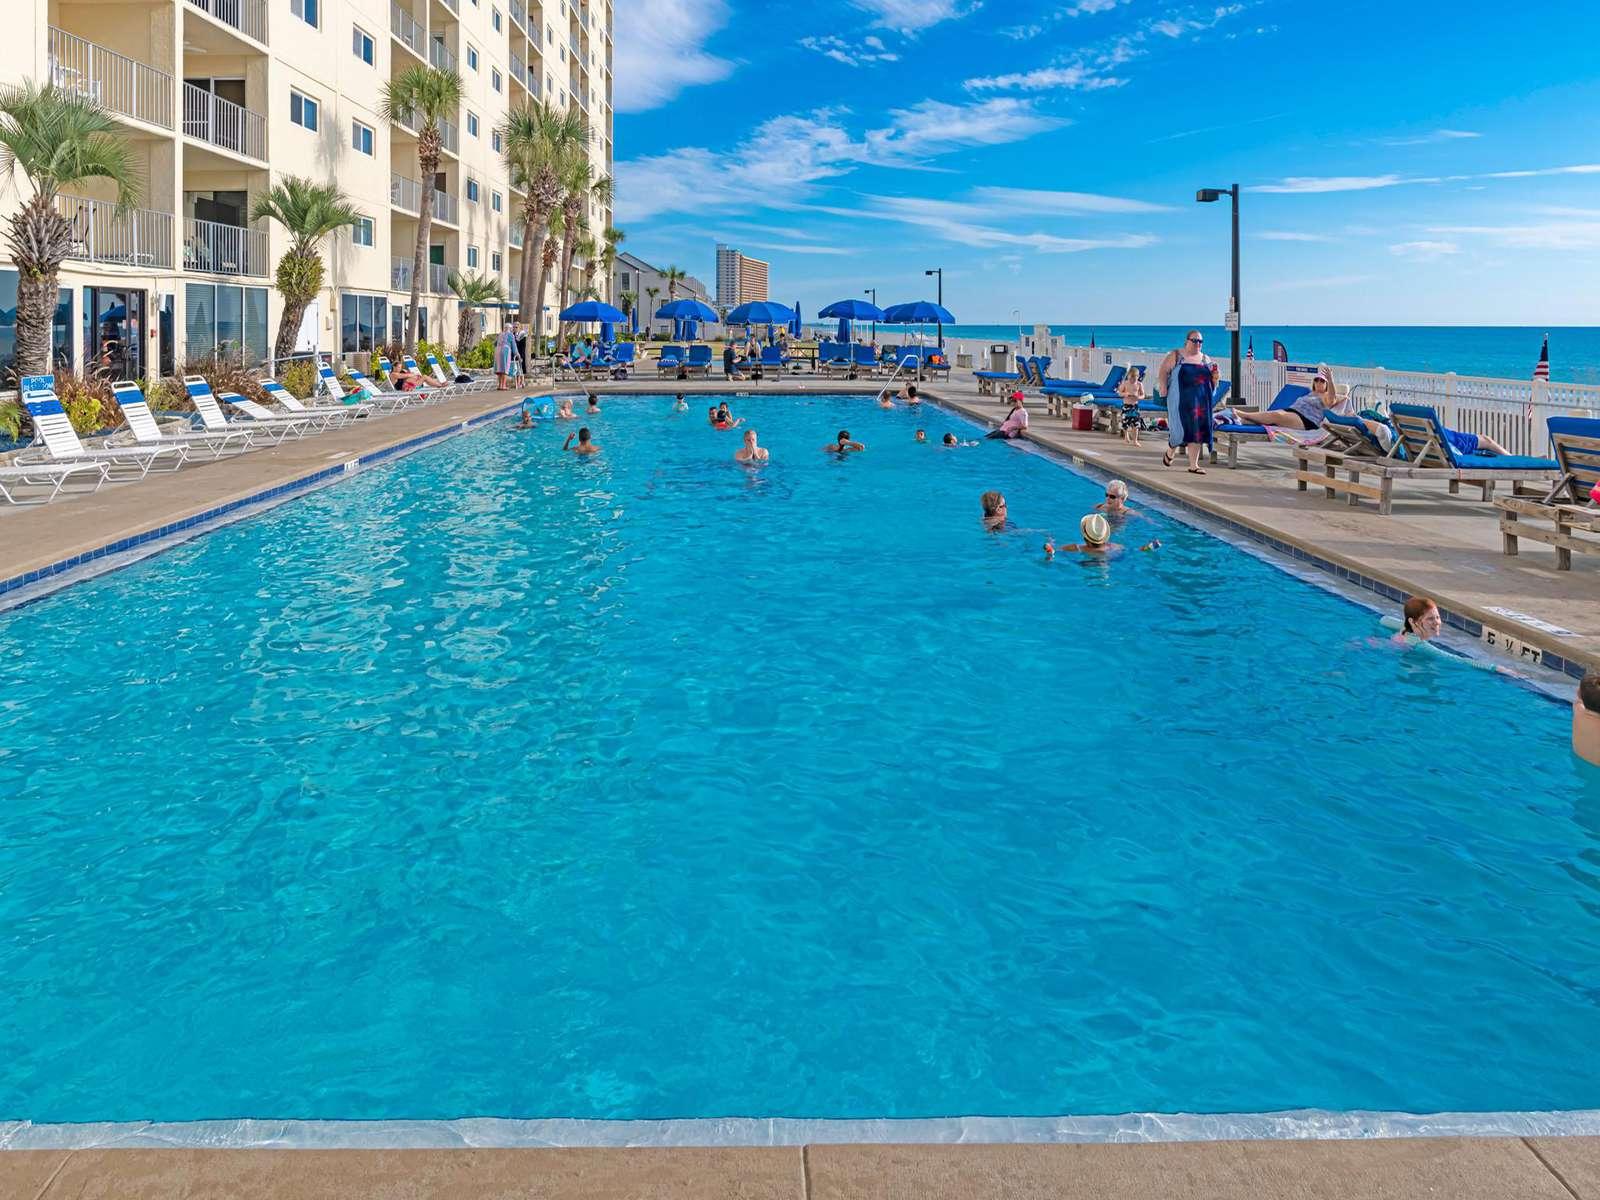 1 of 2 LARGE seasonally heated beachfront pools!